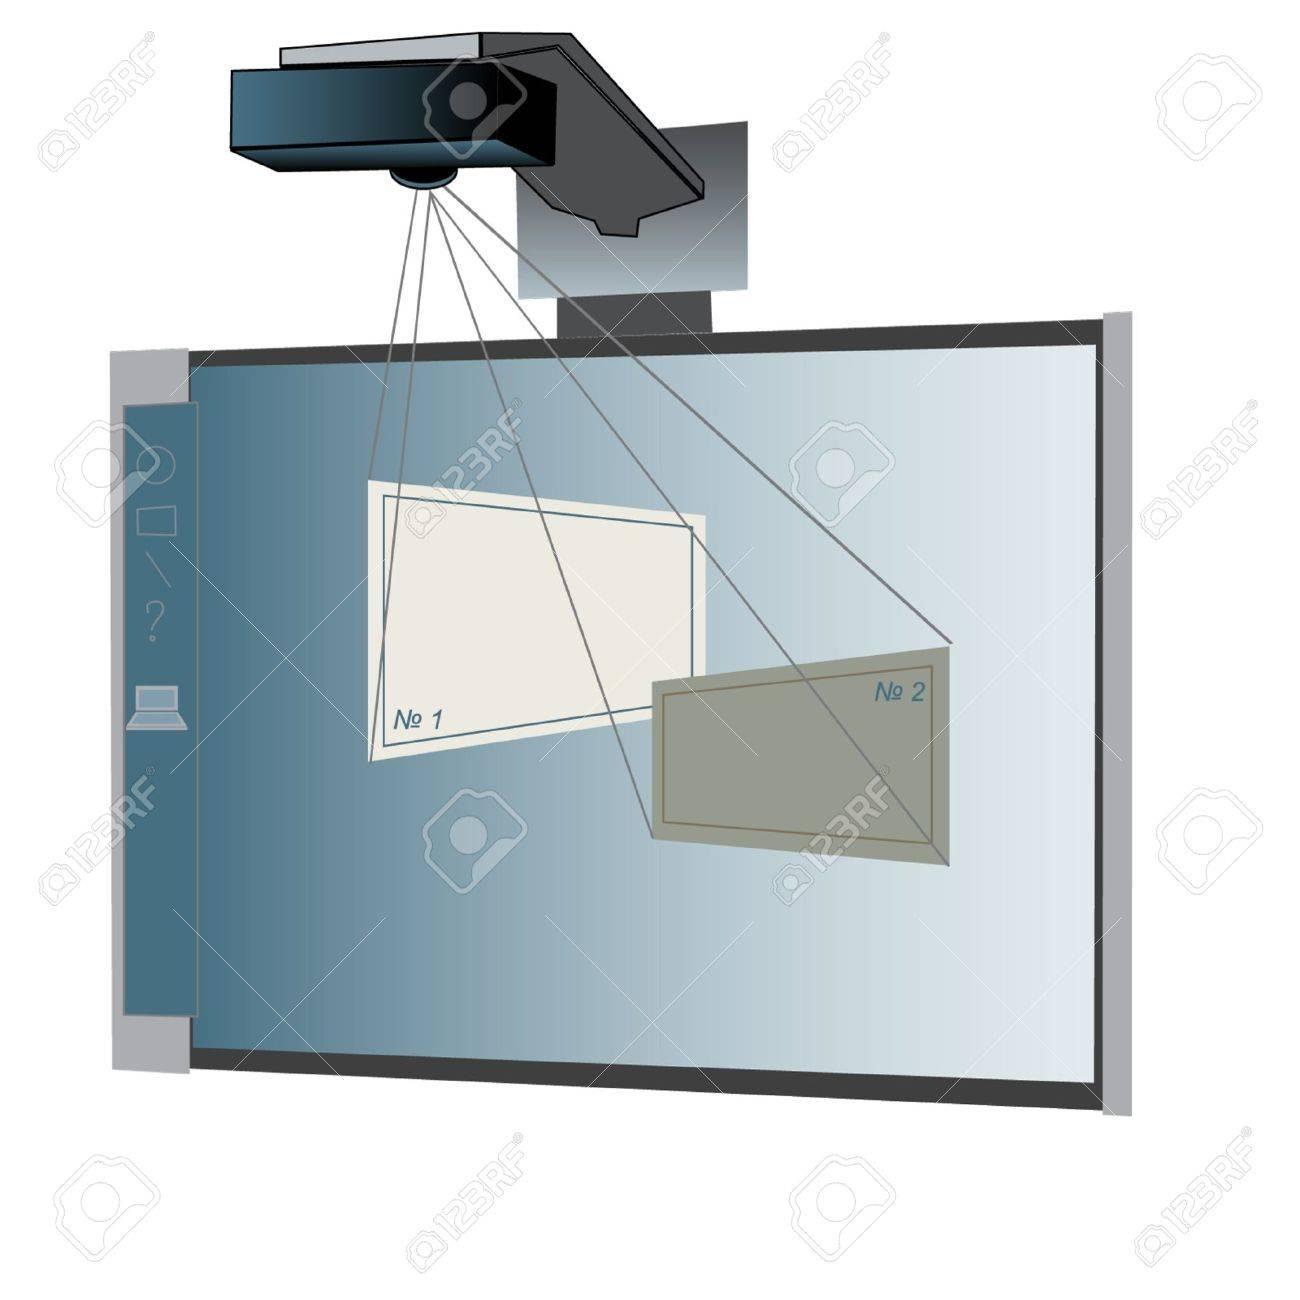 Interactive whiteboard Stock Vector - 15013146